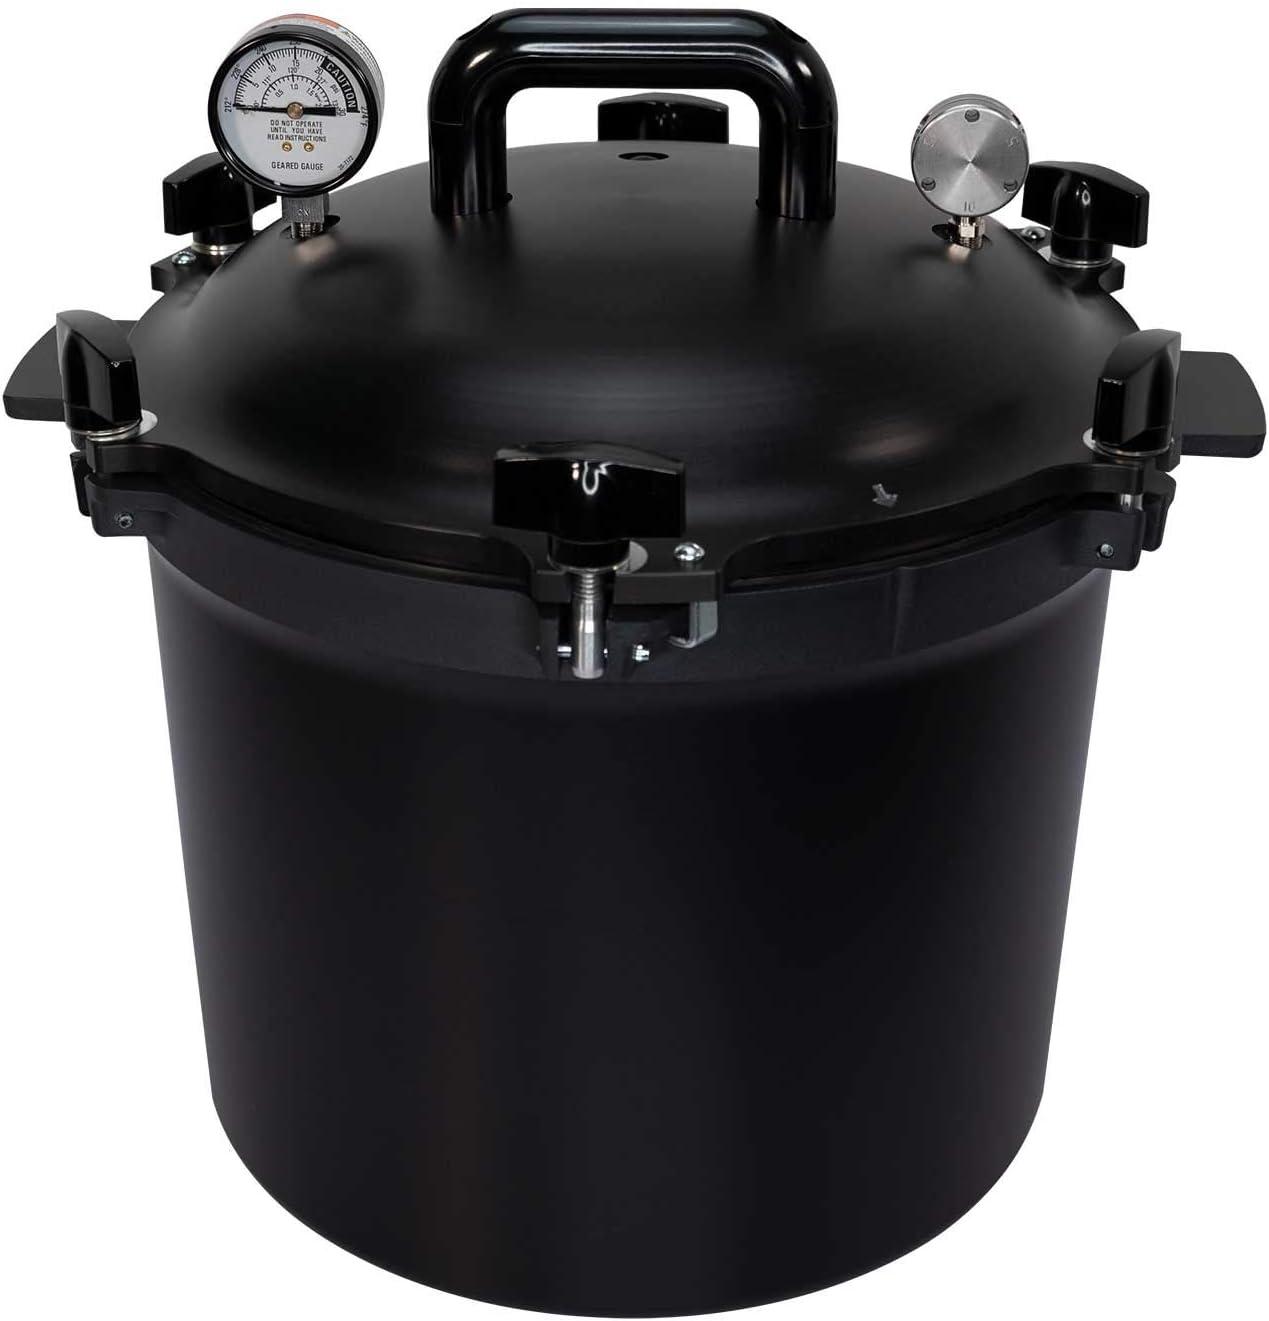 All American 921B Canner Pressure Cooker/Pressure Canner - (21.5-QT) Black